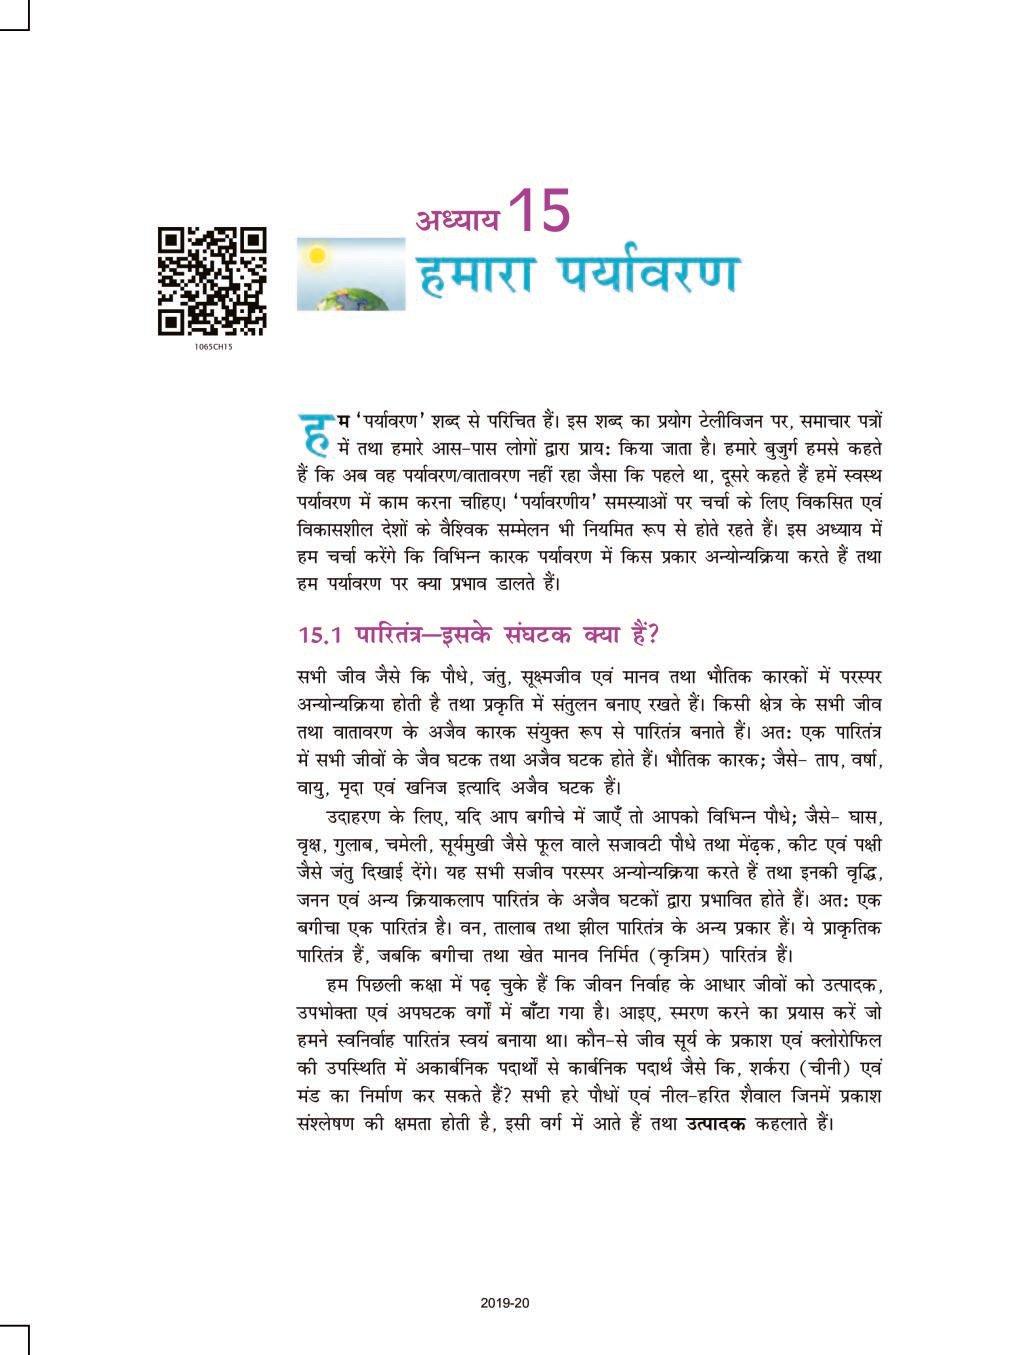 NCERT Book Class 10 Science (विज्ञान) Chapter 15 हमारा पर्यावरण - Page 1